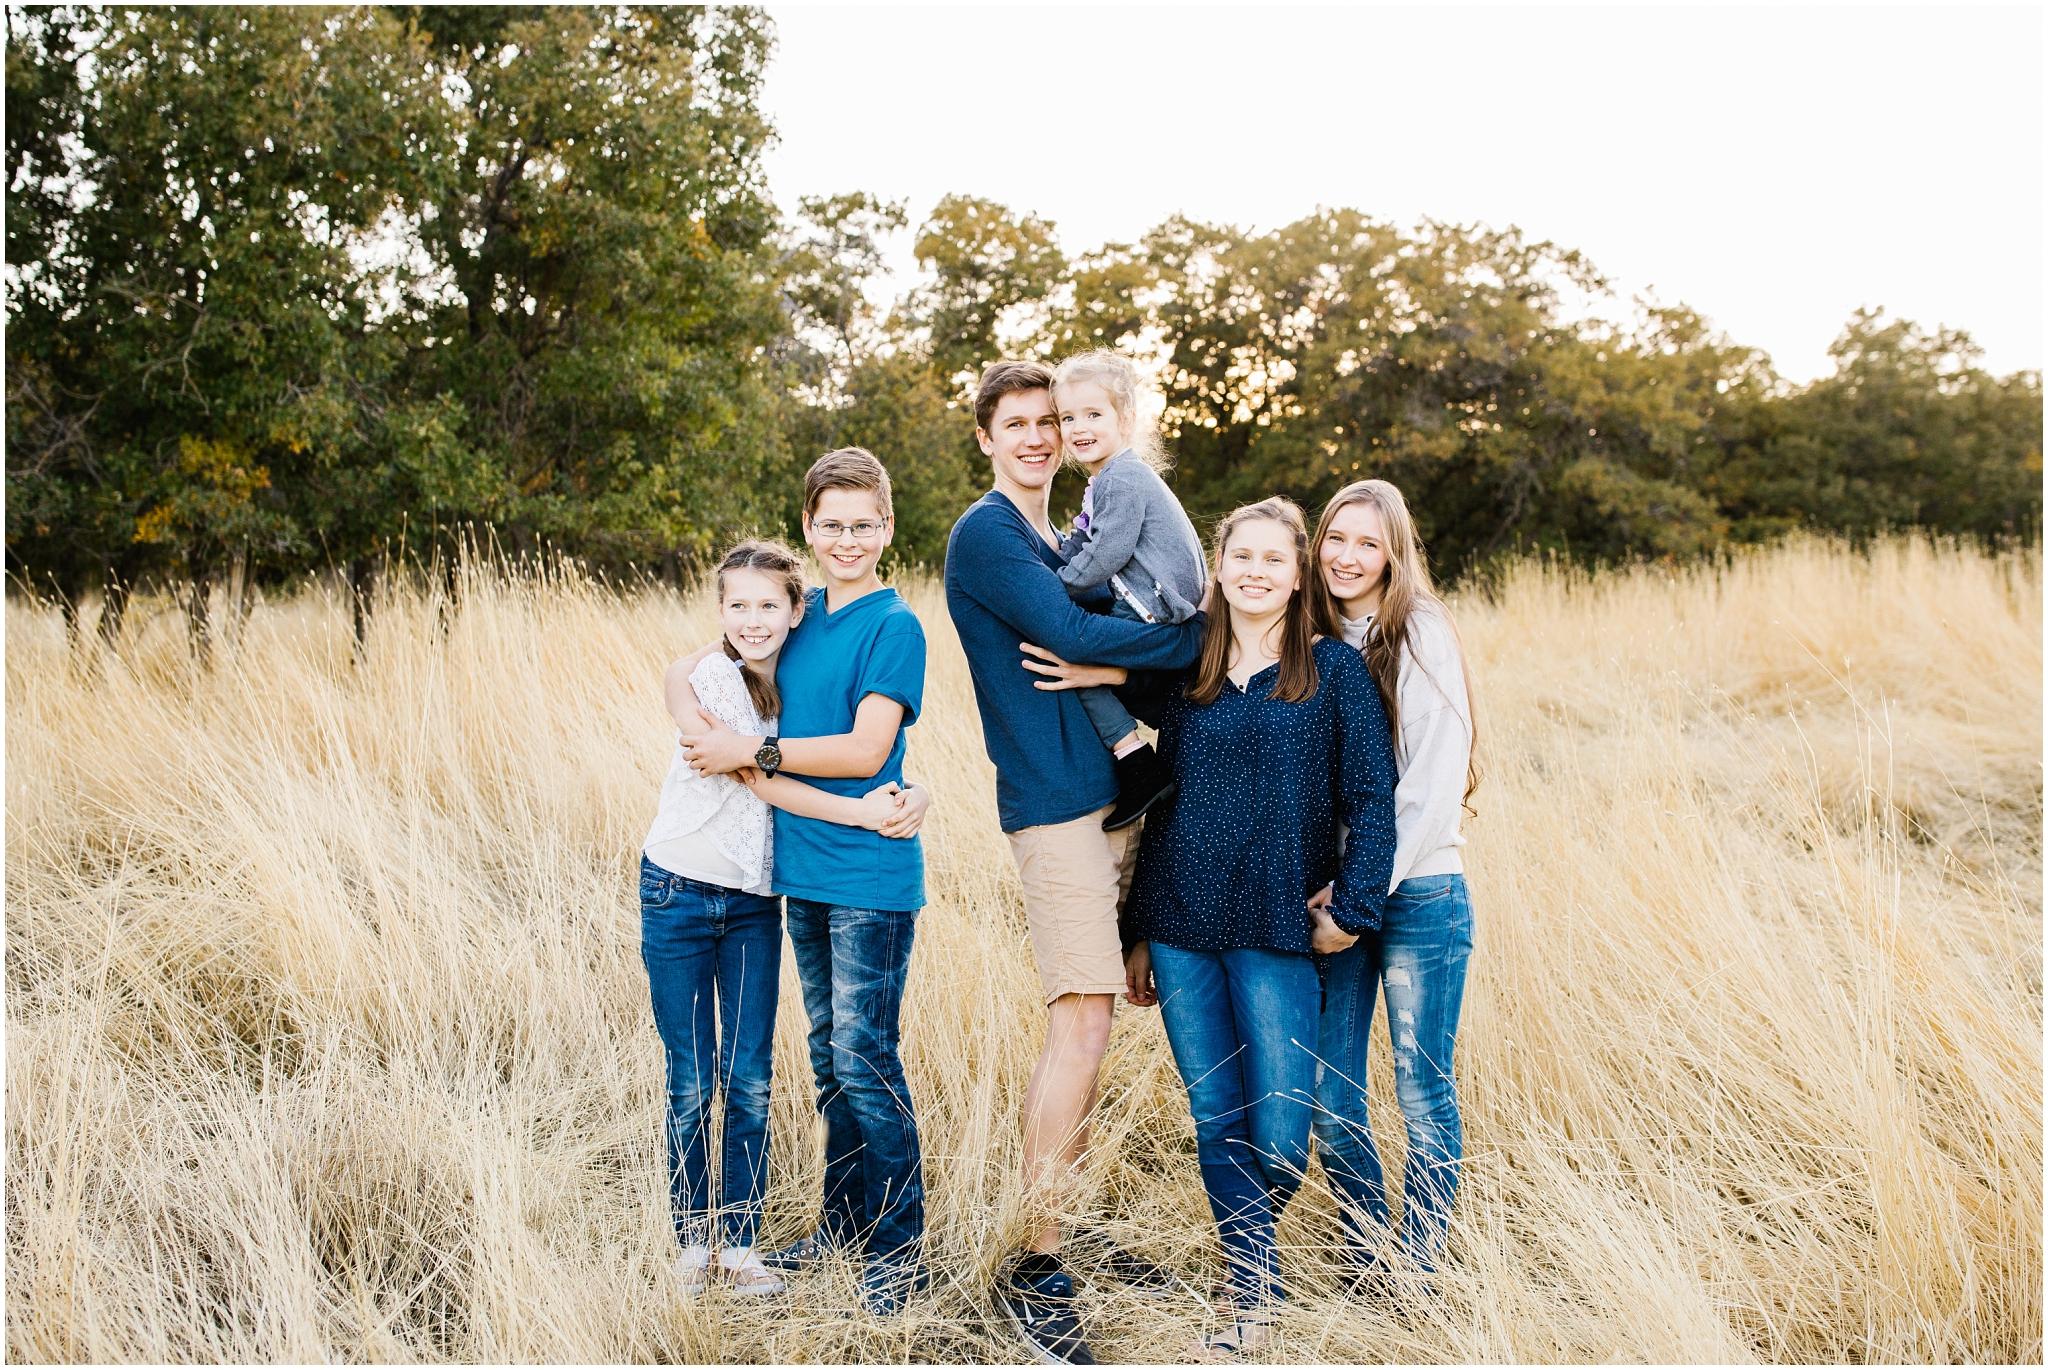 Jaursch-182_Lizzie-B-Imagery-Utah-Family-Photographer-Salt-Lake-City-Park-City-Herriman-Utah-County.jpg